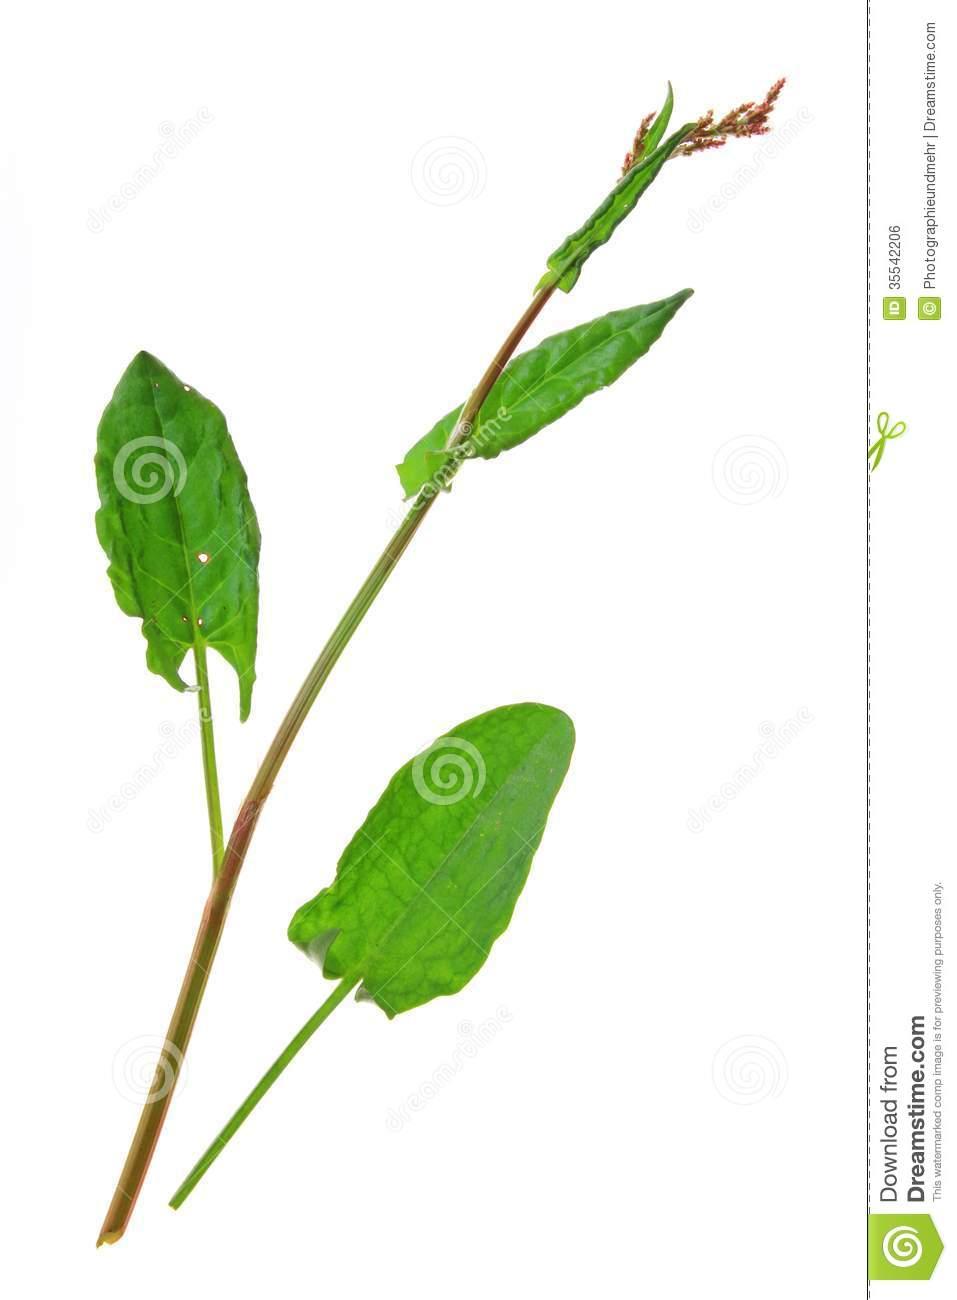 Garden Sorrel (Rumex Acetosa) Royalty Free Stock Image.